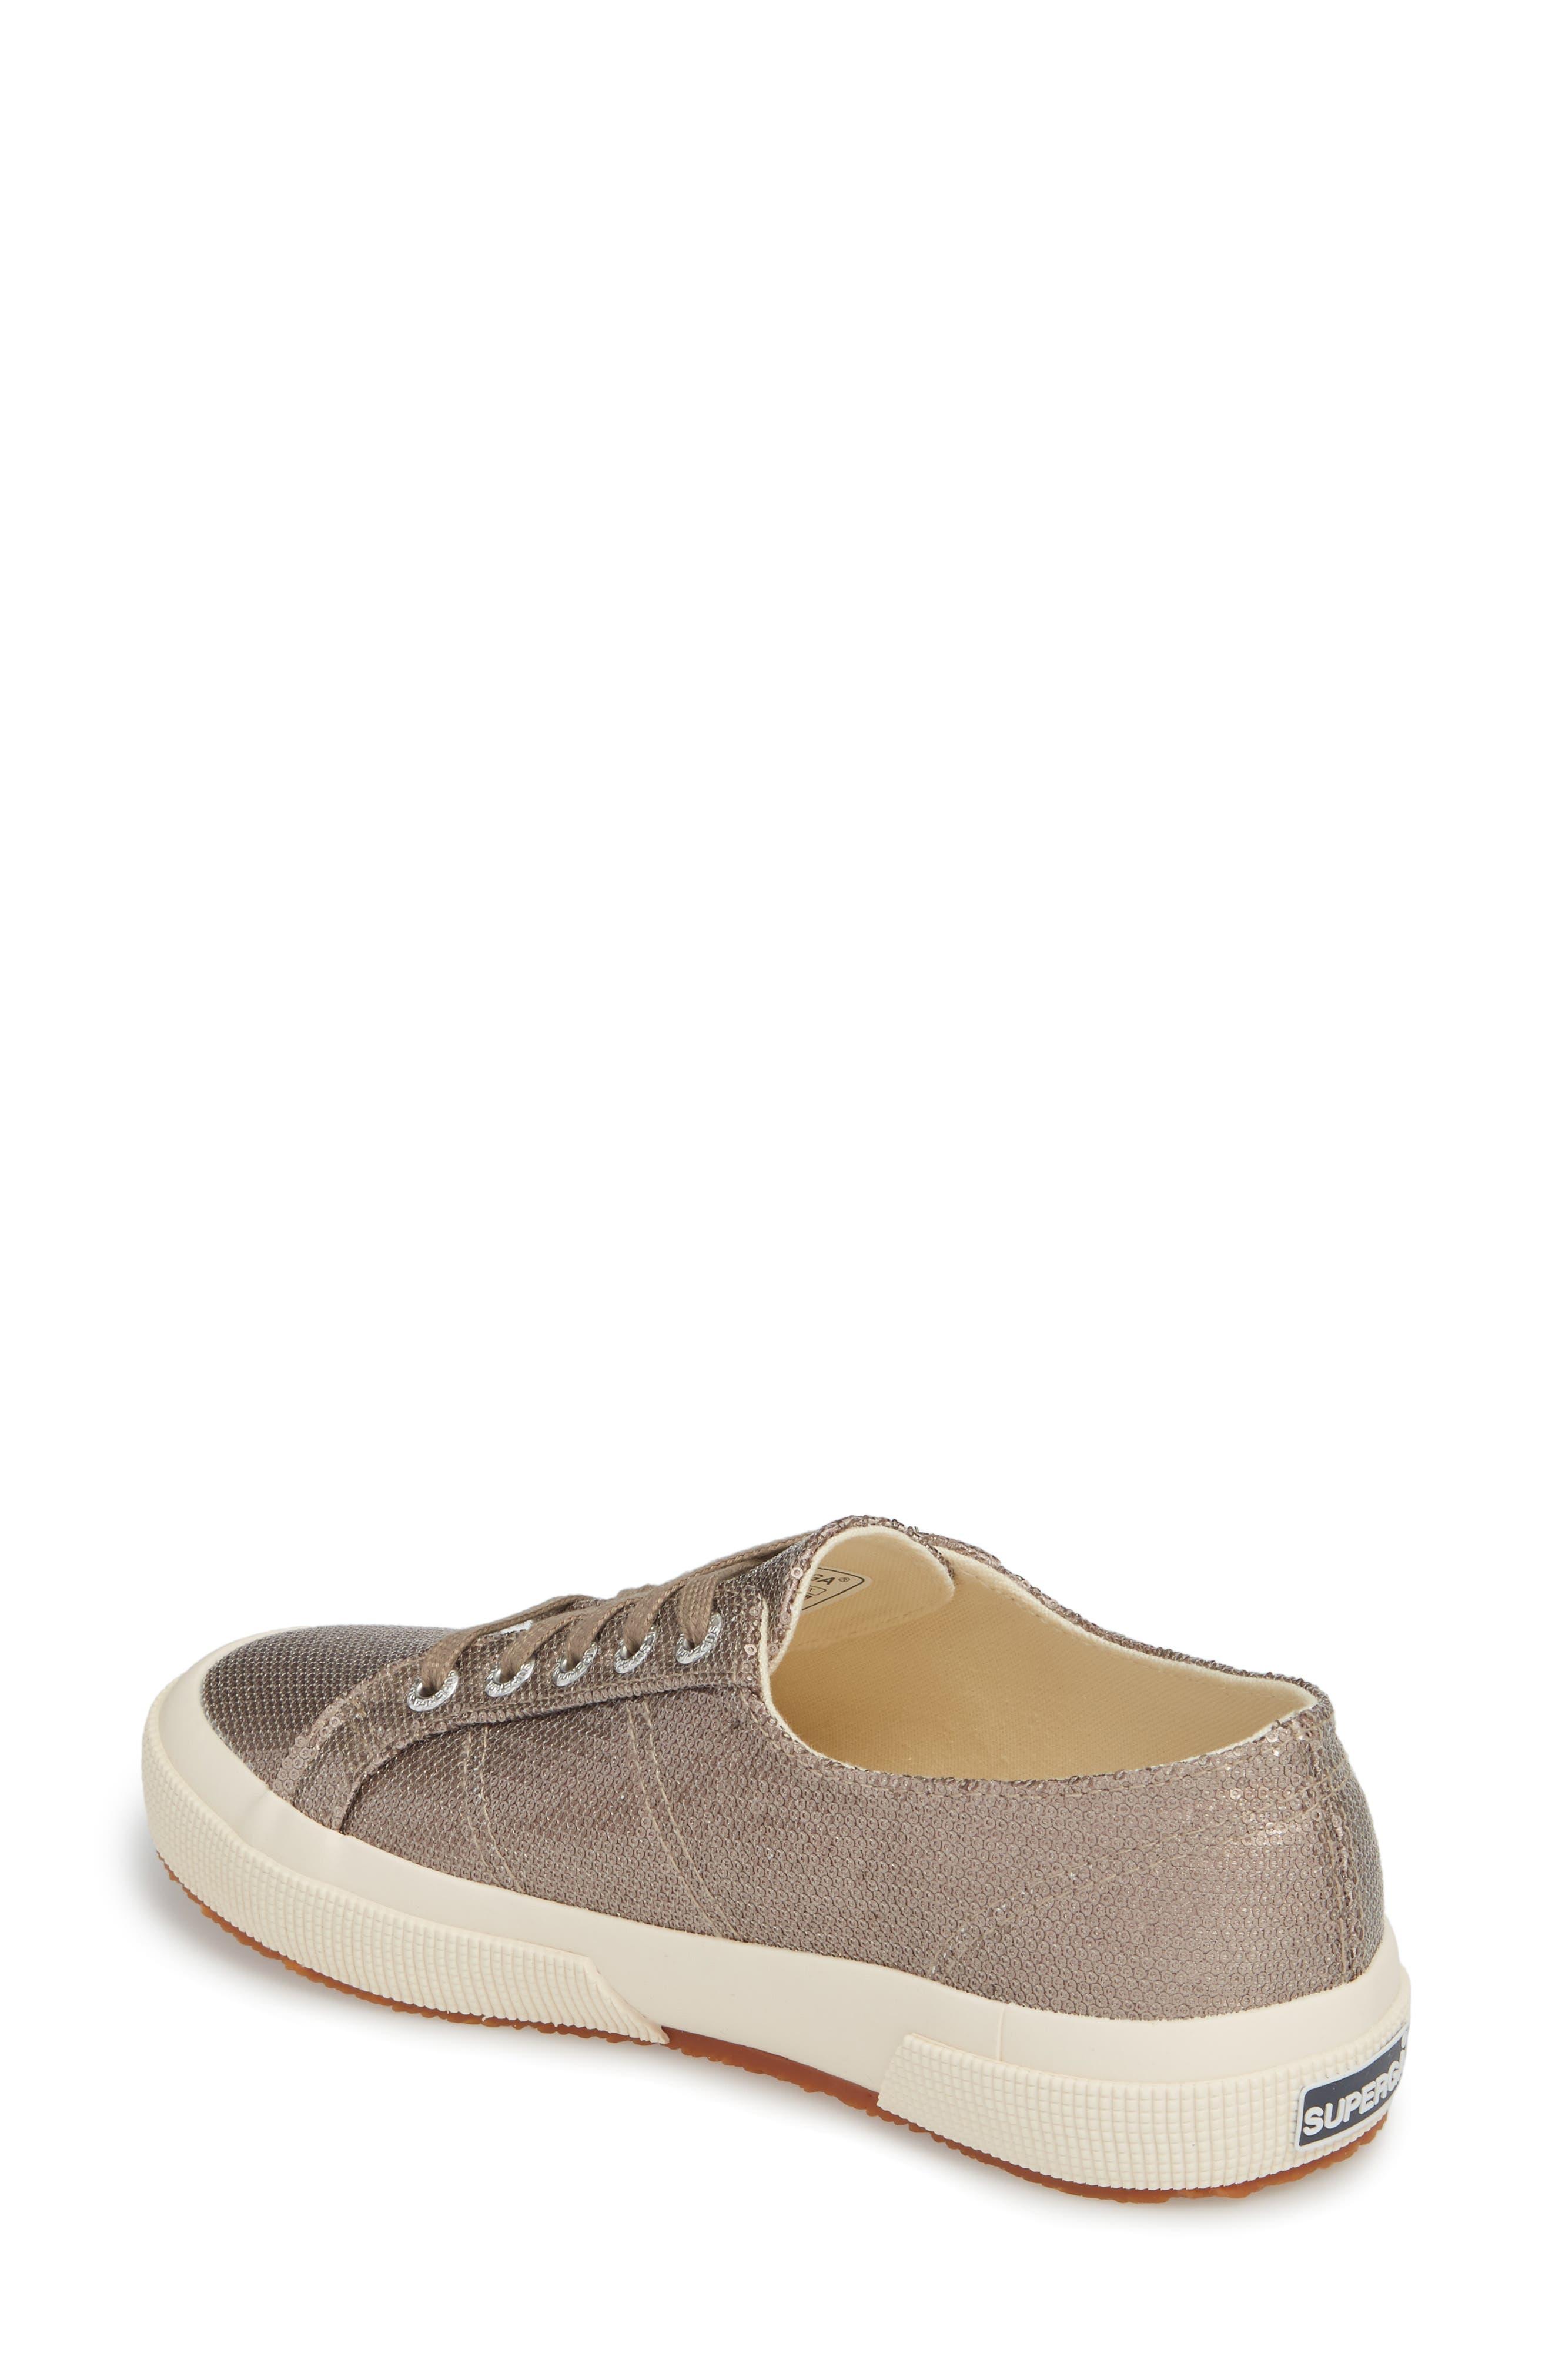 2750 Micro Sequin Sneaker,                             Alternate thumbnail 2, color,